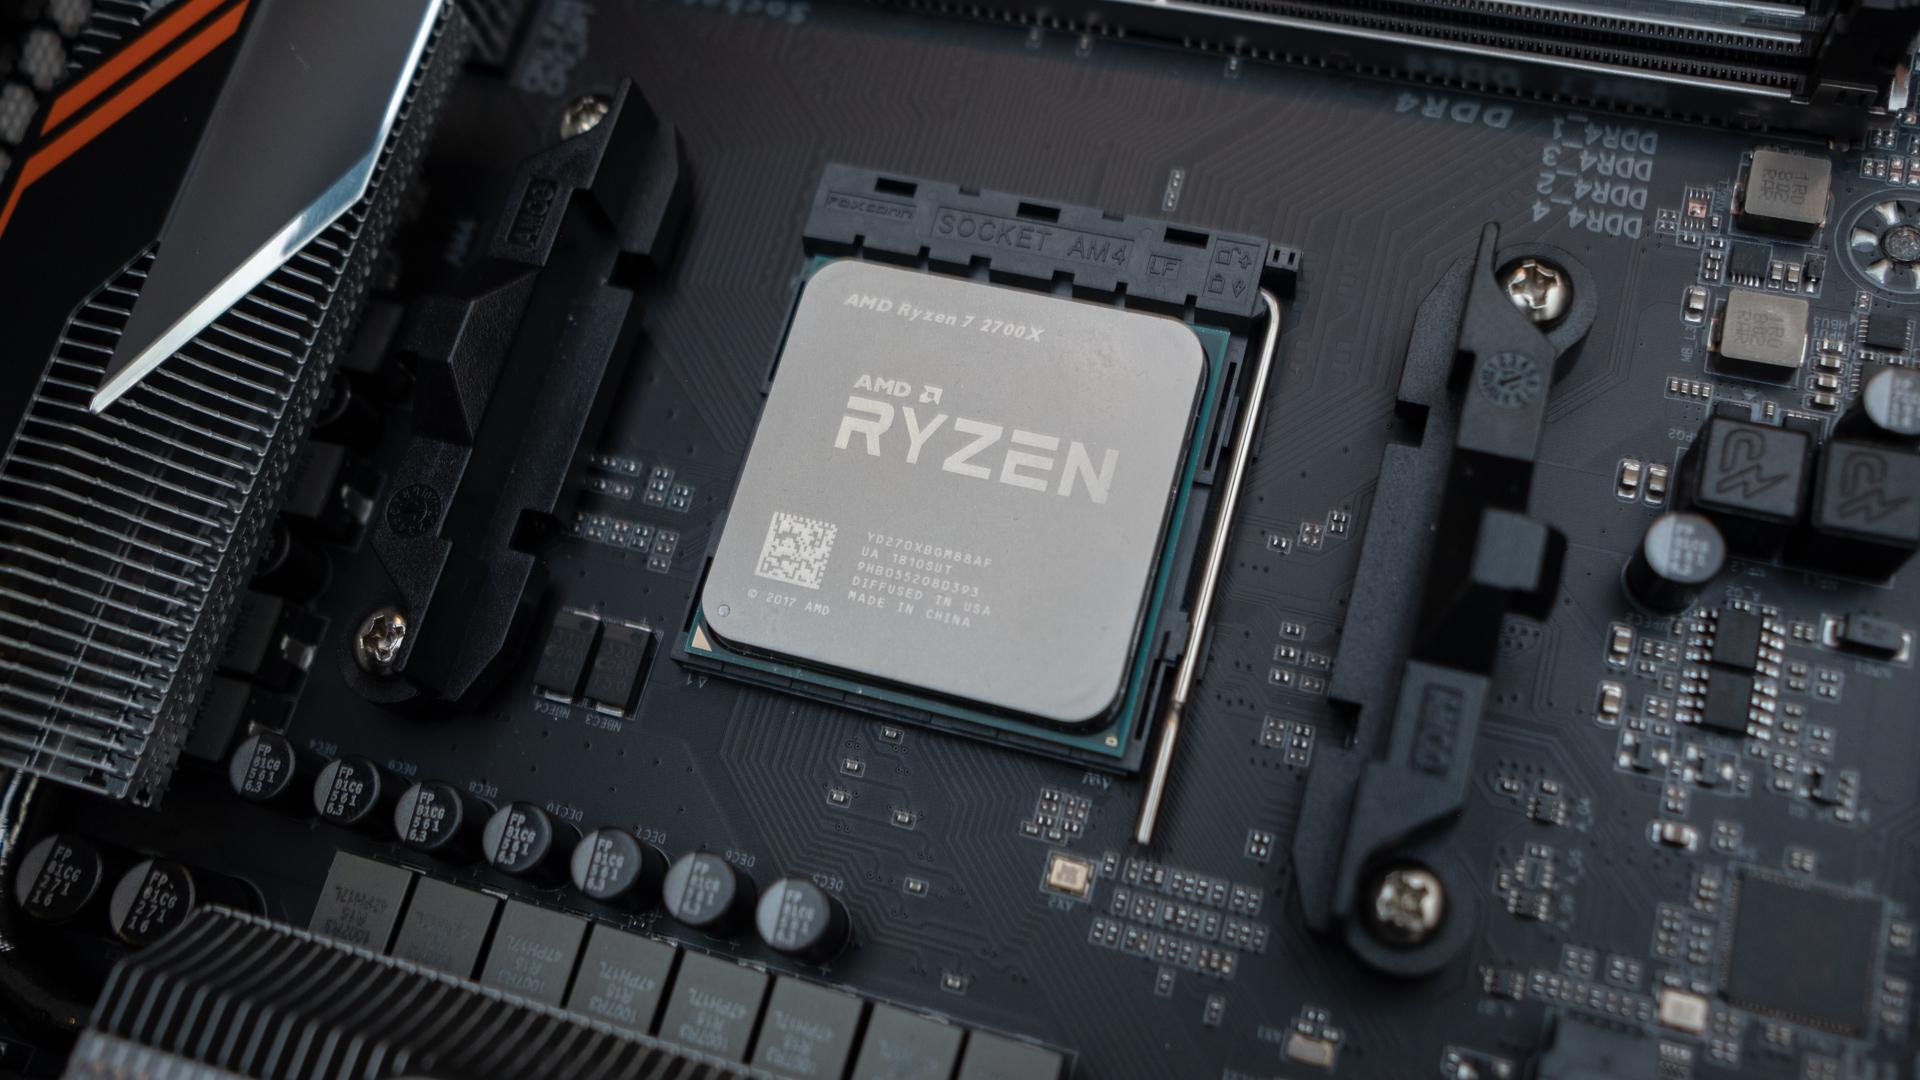 AMD Ryzen 7 2700X Anniversary Edition processor pops up online